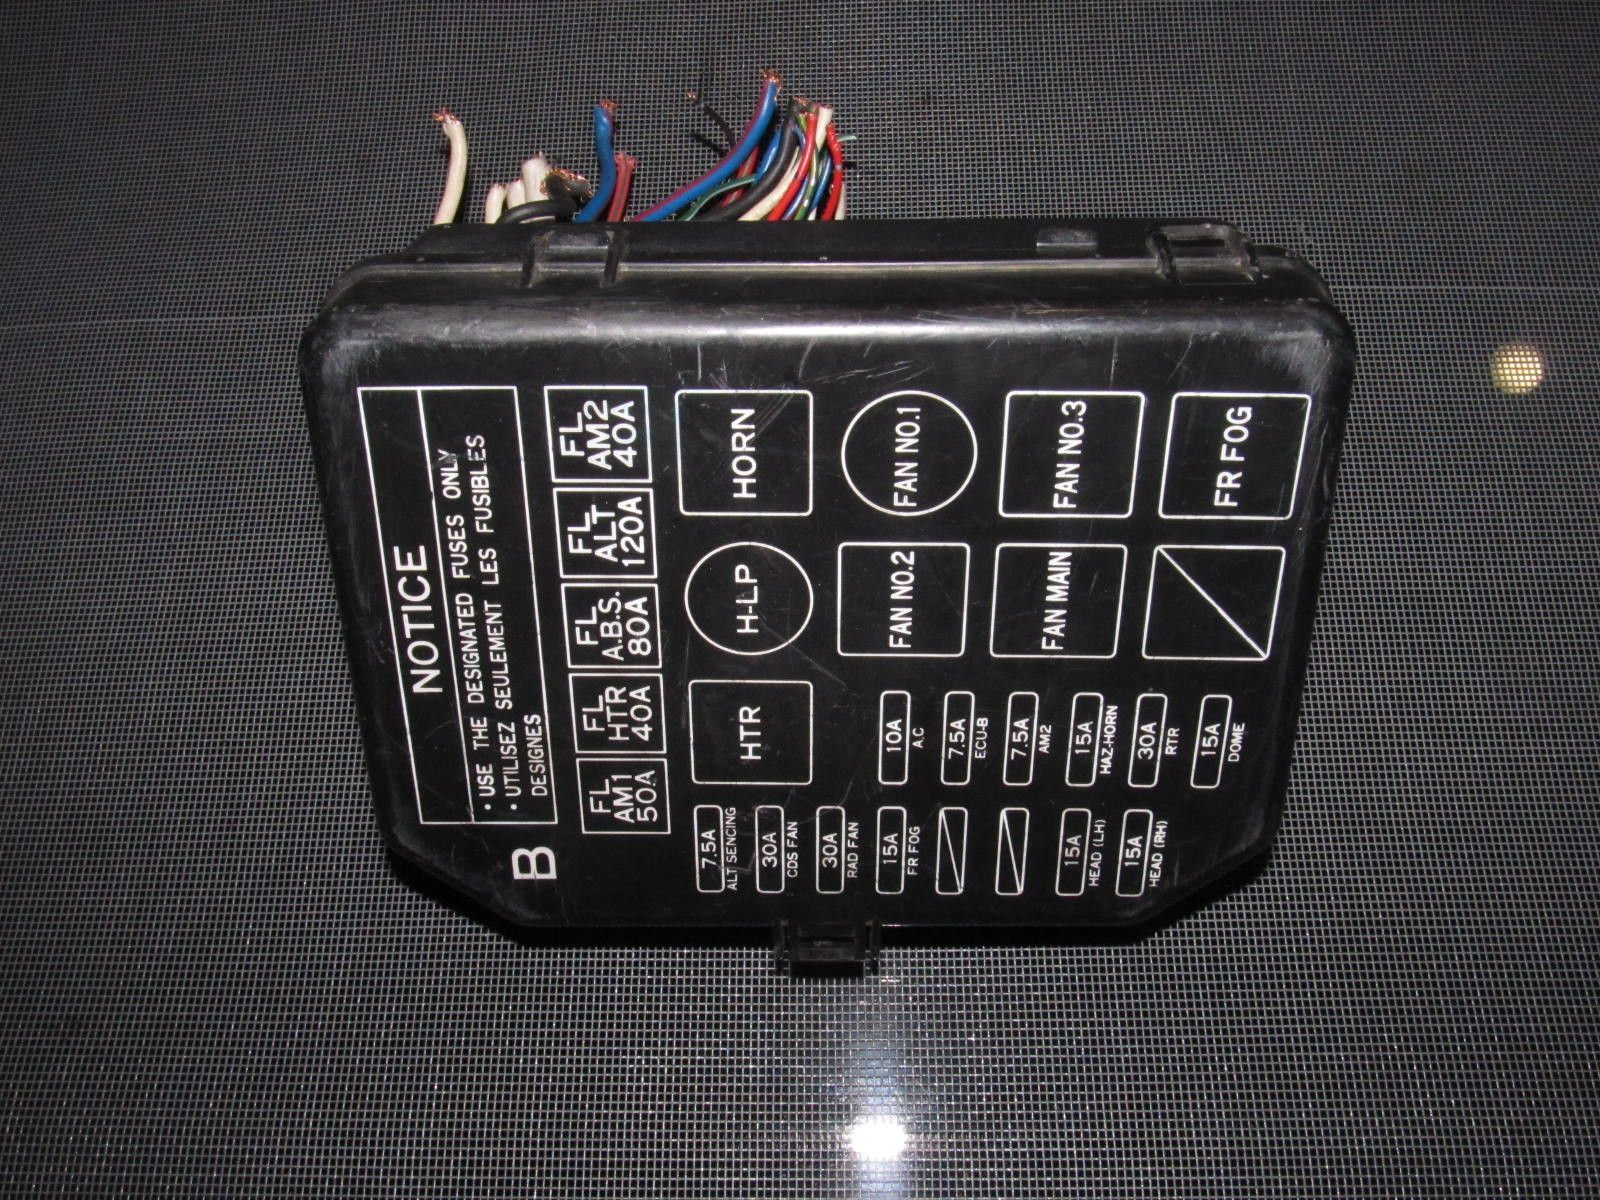 medium resolution of 91 95 toyota mr2 oem interior fuse box autopartone com products 2000 f150 fuse box diagram